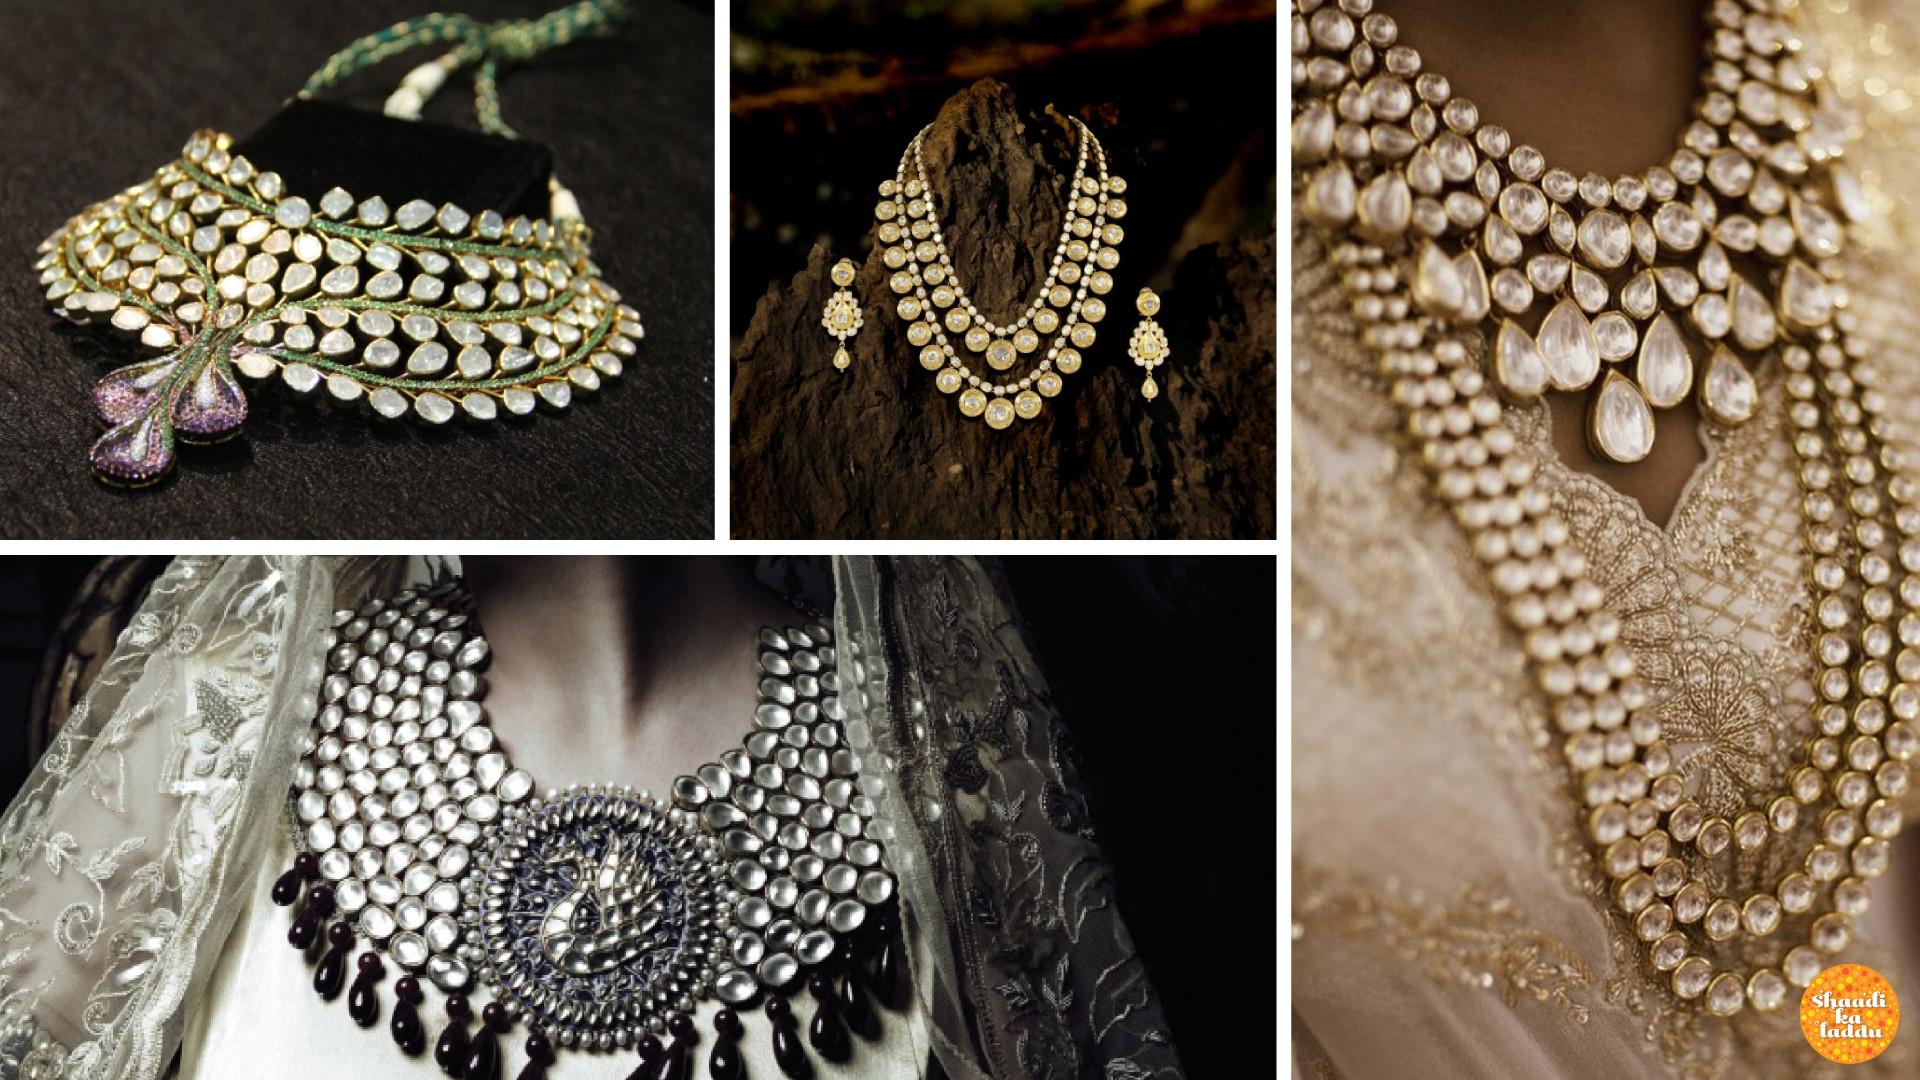 Heavy Kundan necklaces and earrings, Kundan long neckchains, Silver jewellery mixed Kundan gemstones neckpiece